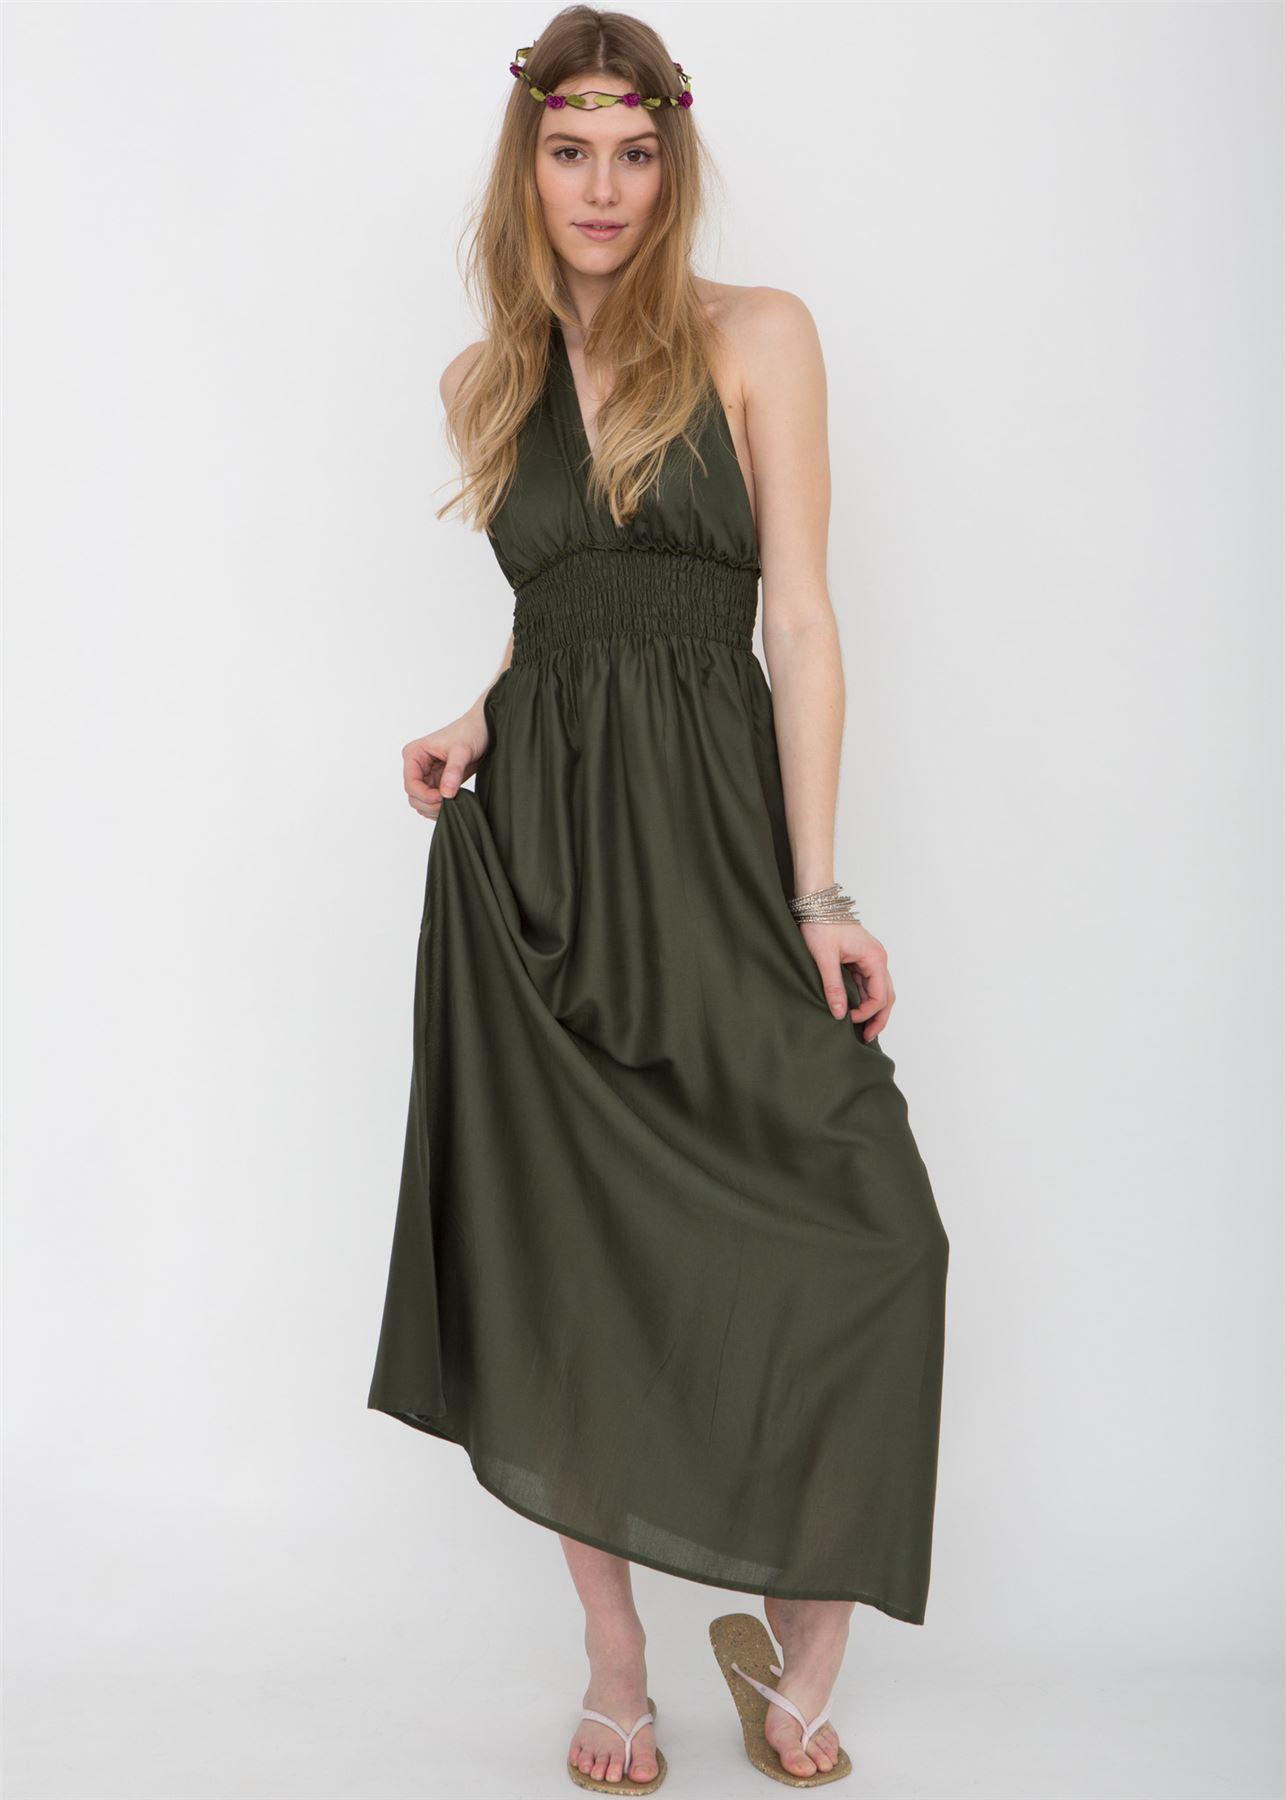 tiefer Rücken Nackenband Maxi Kleid khaki | eBay